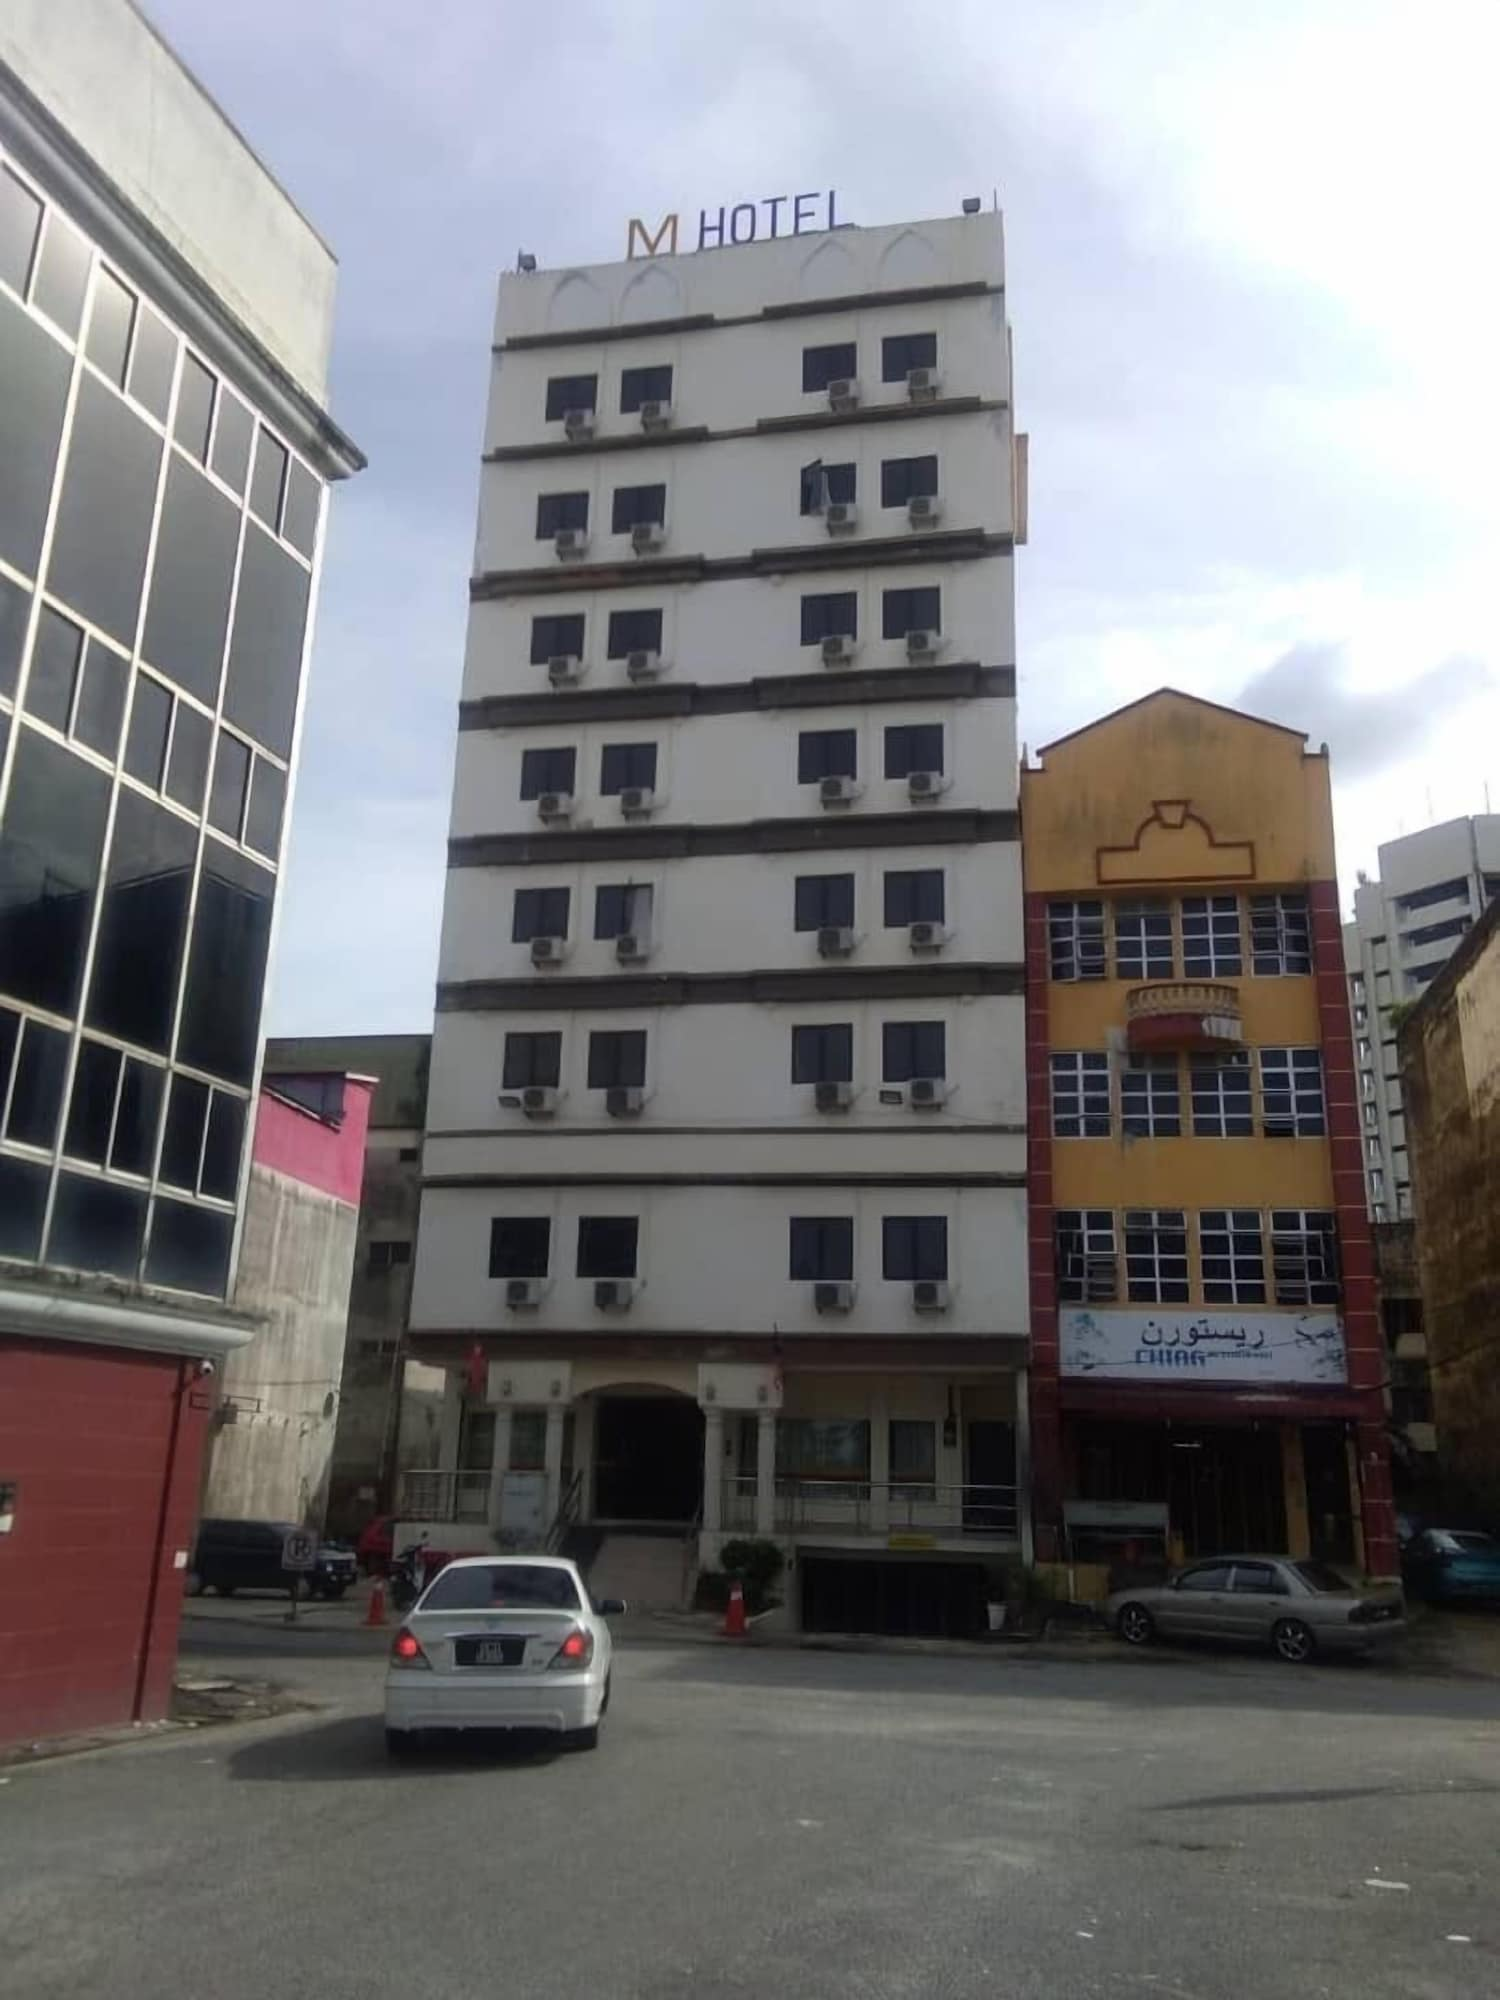 Hotel Mewah Impiana, Kota Bharu